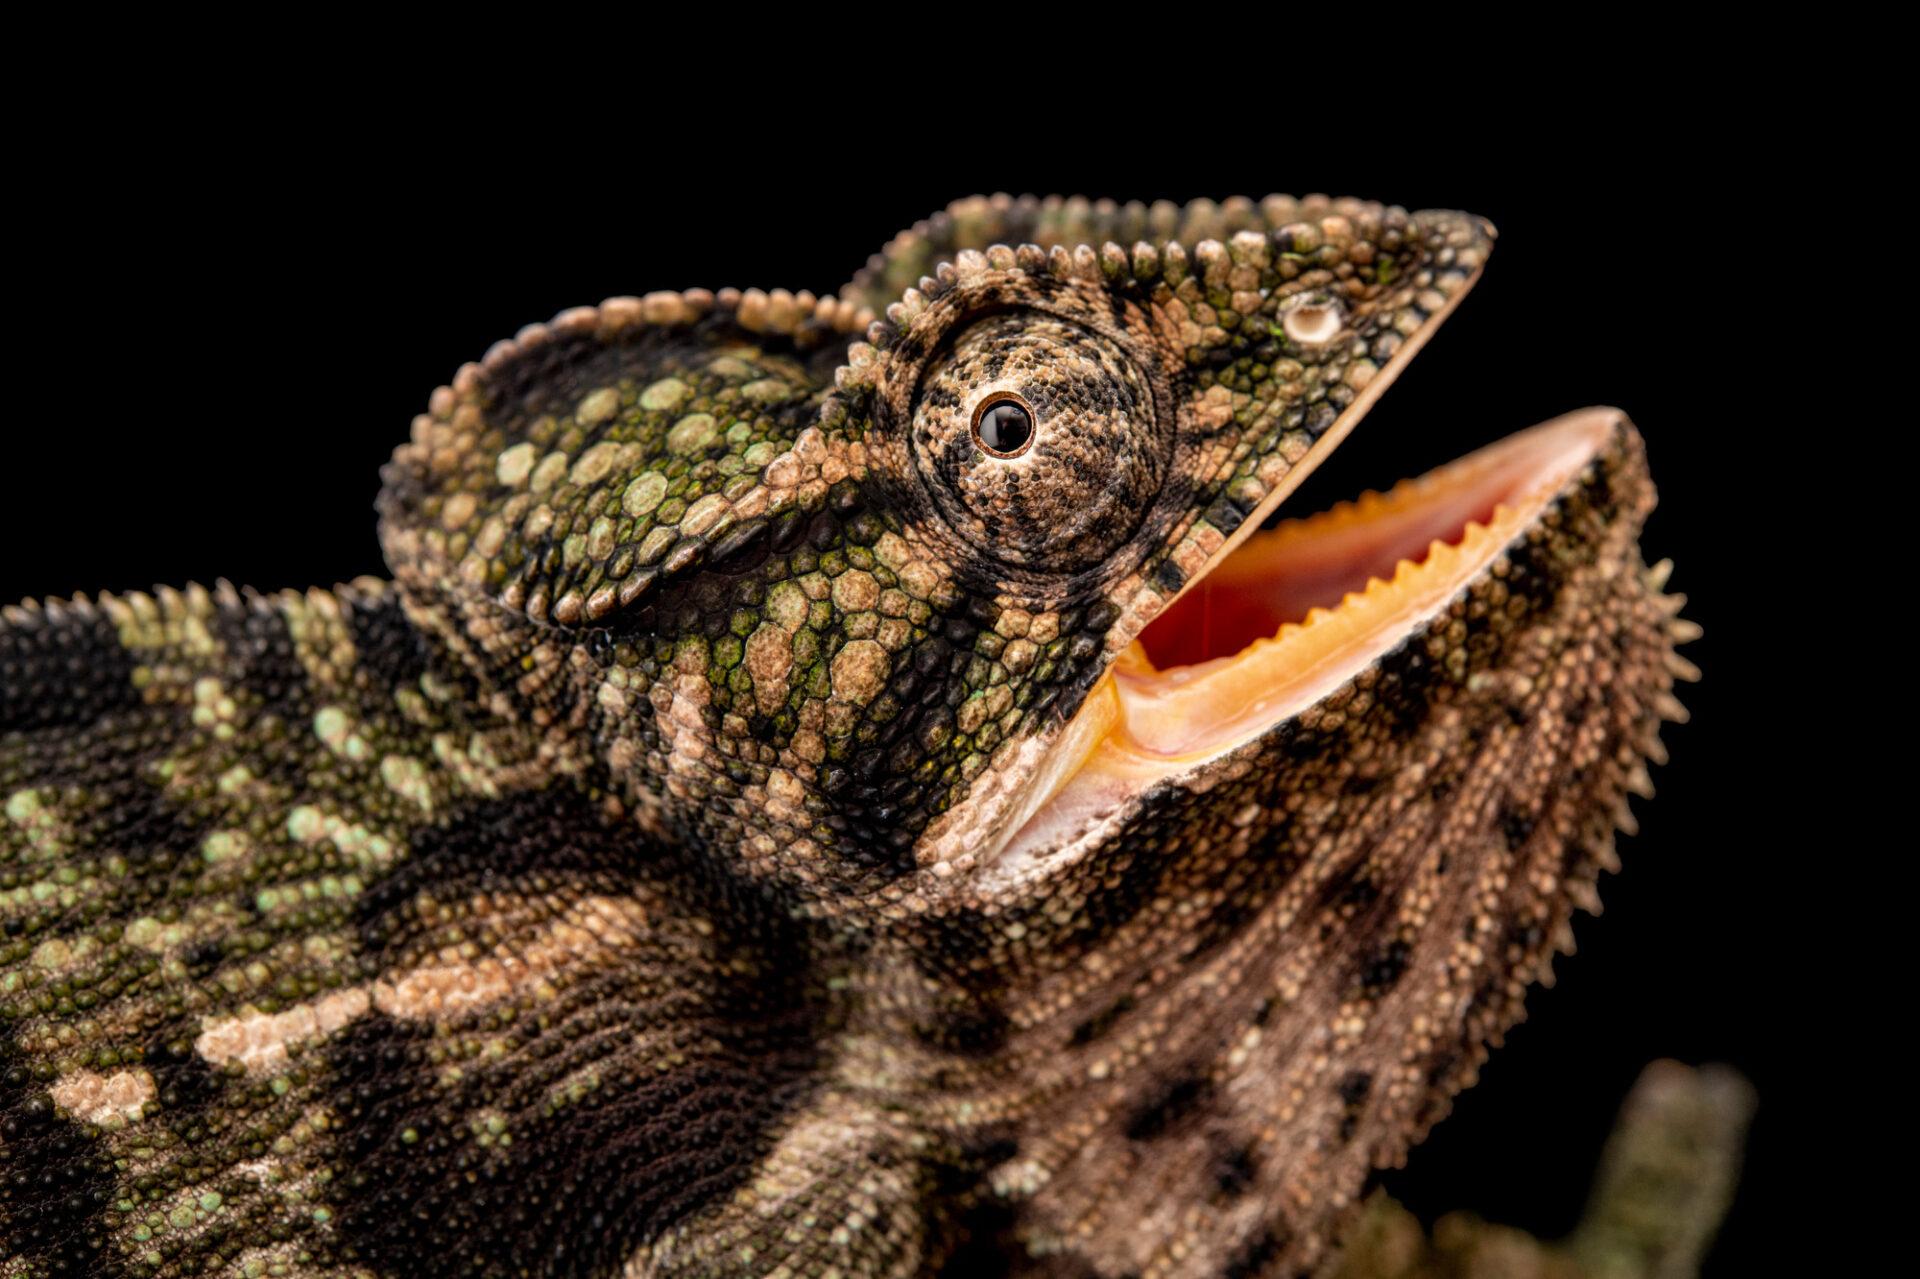 Photo: A female greater carpet chameleon (Furcifer major) at Zoopark Zajezd.